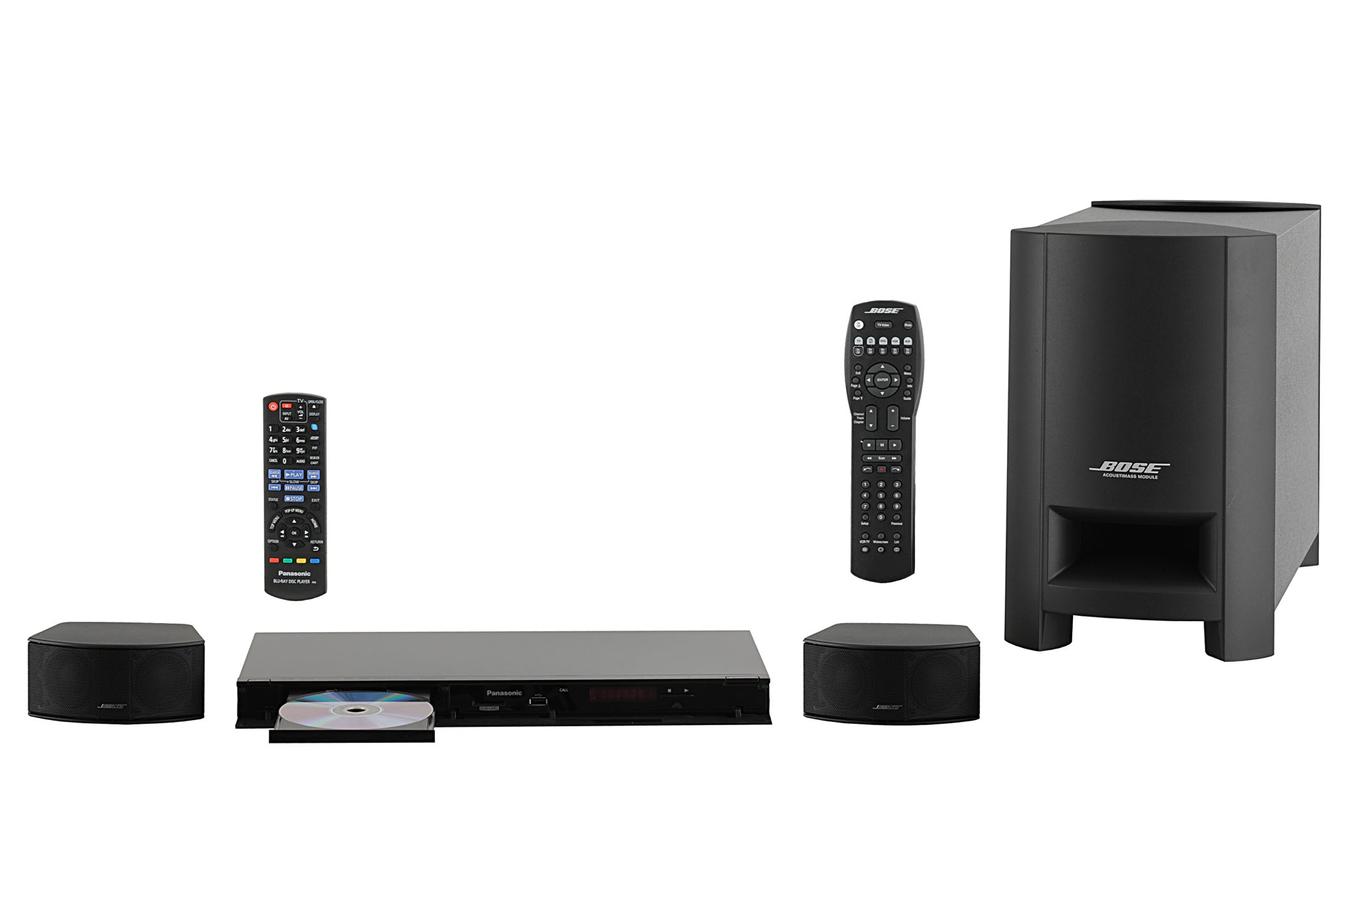 enceinte pour tv bose cinemate blu ray 3522571 darty. Black Bedroom Furniture Sets. Home Design Ideas